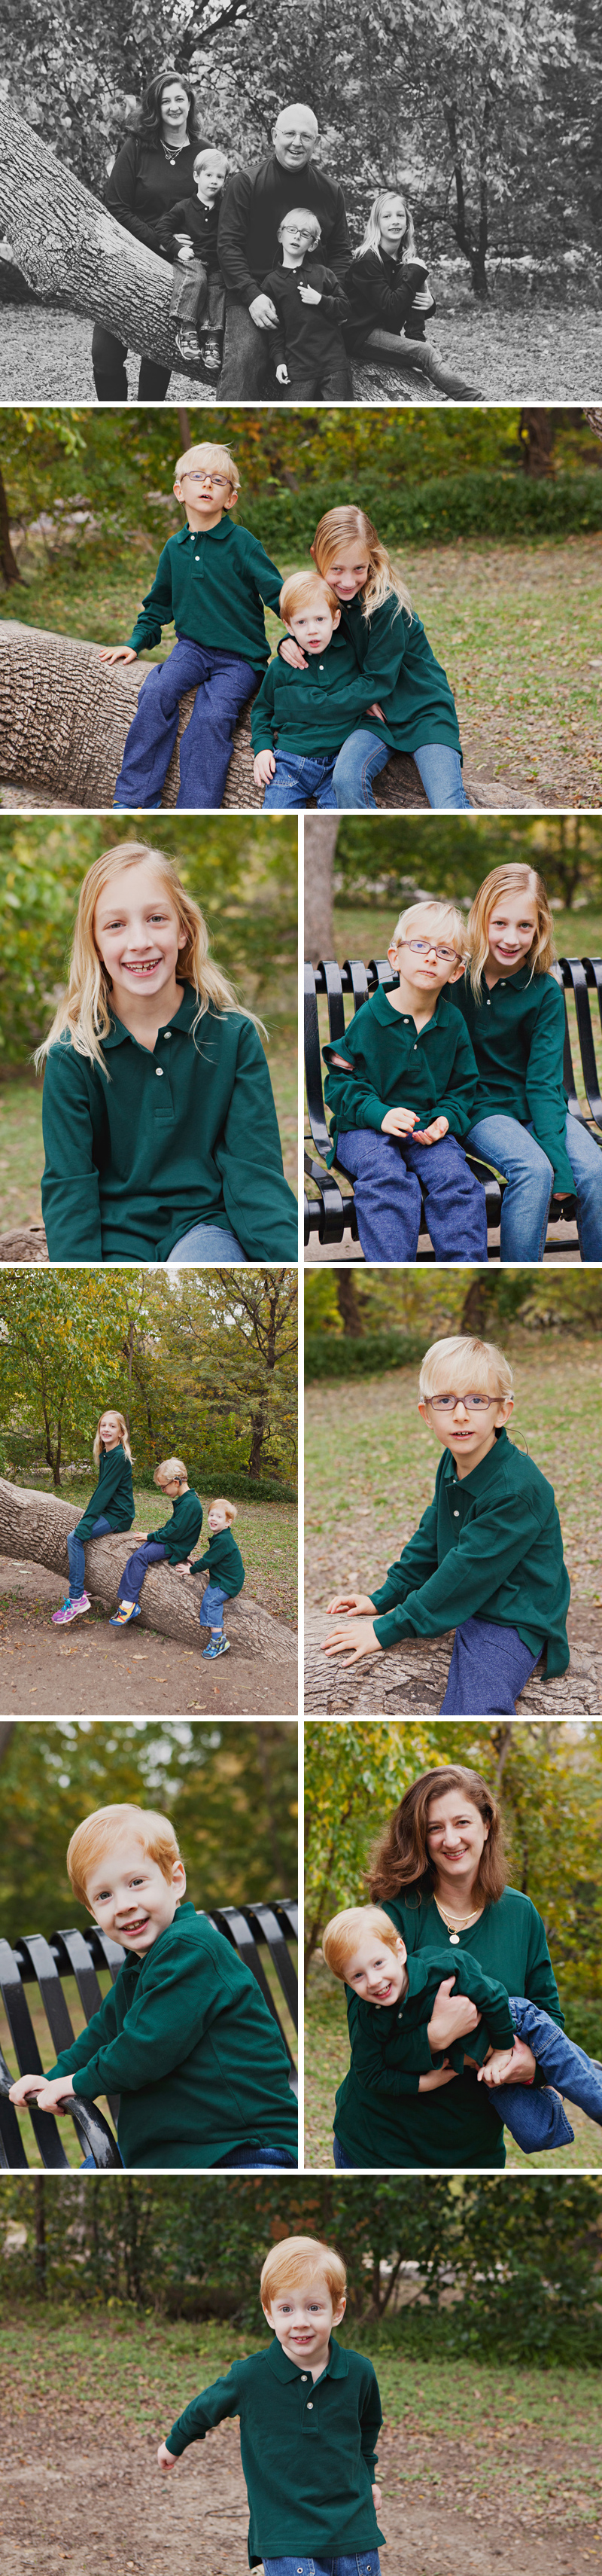 Dallas-Family-Photographerc046